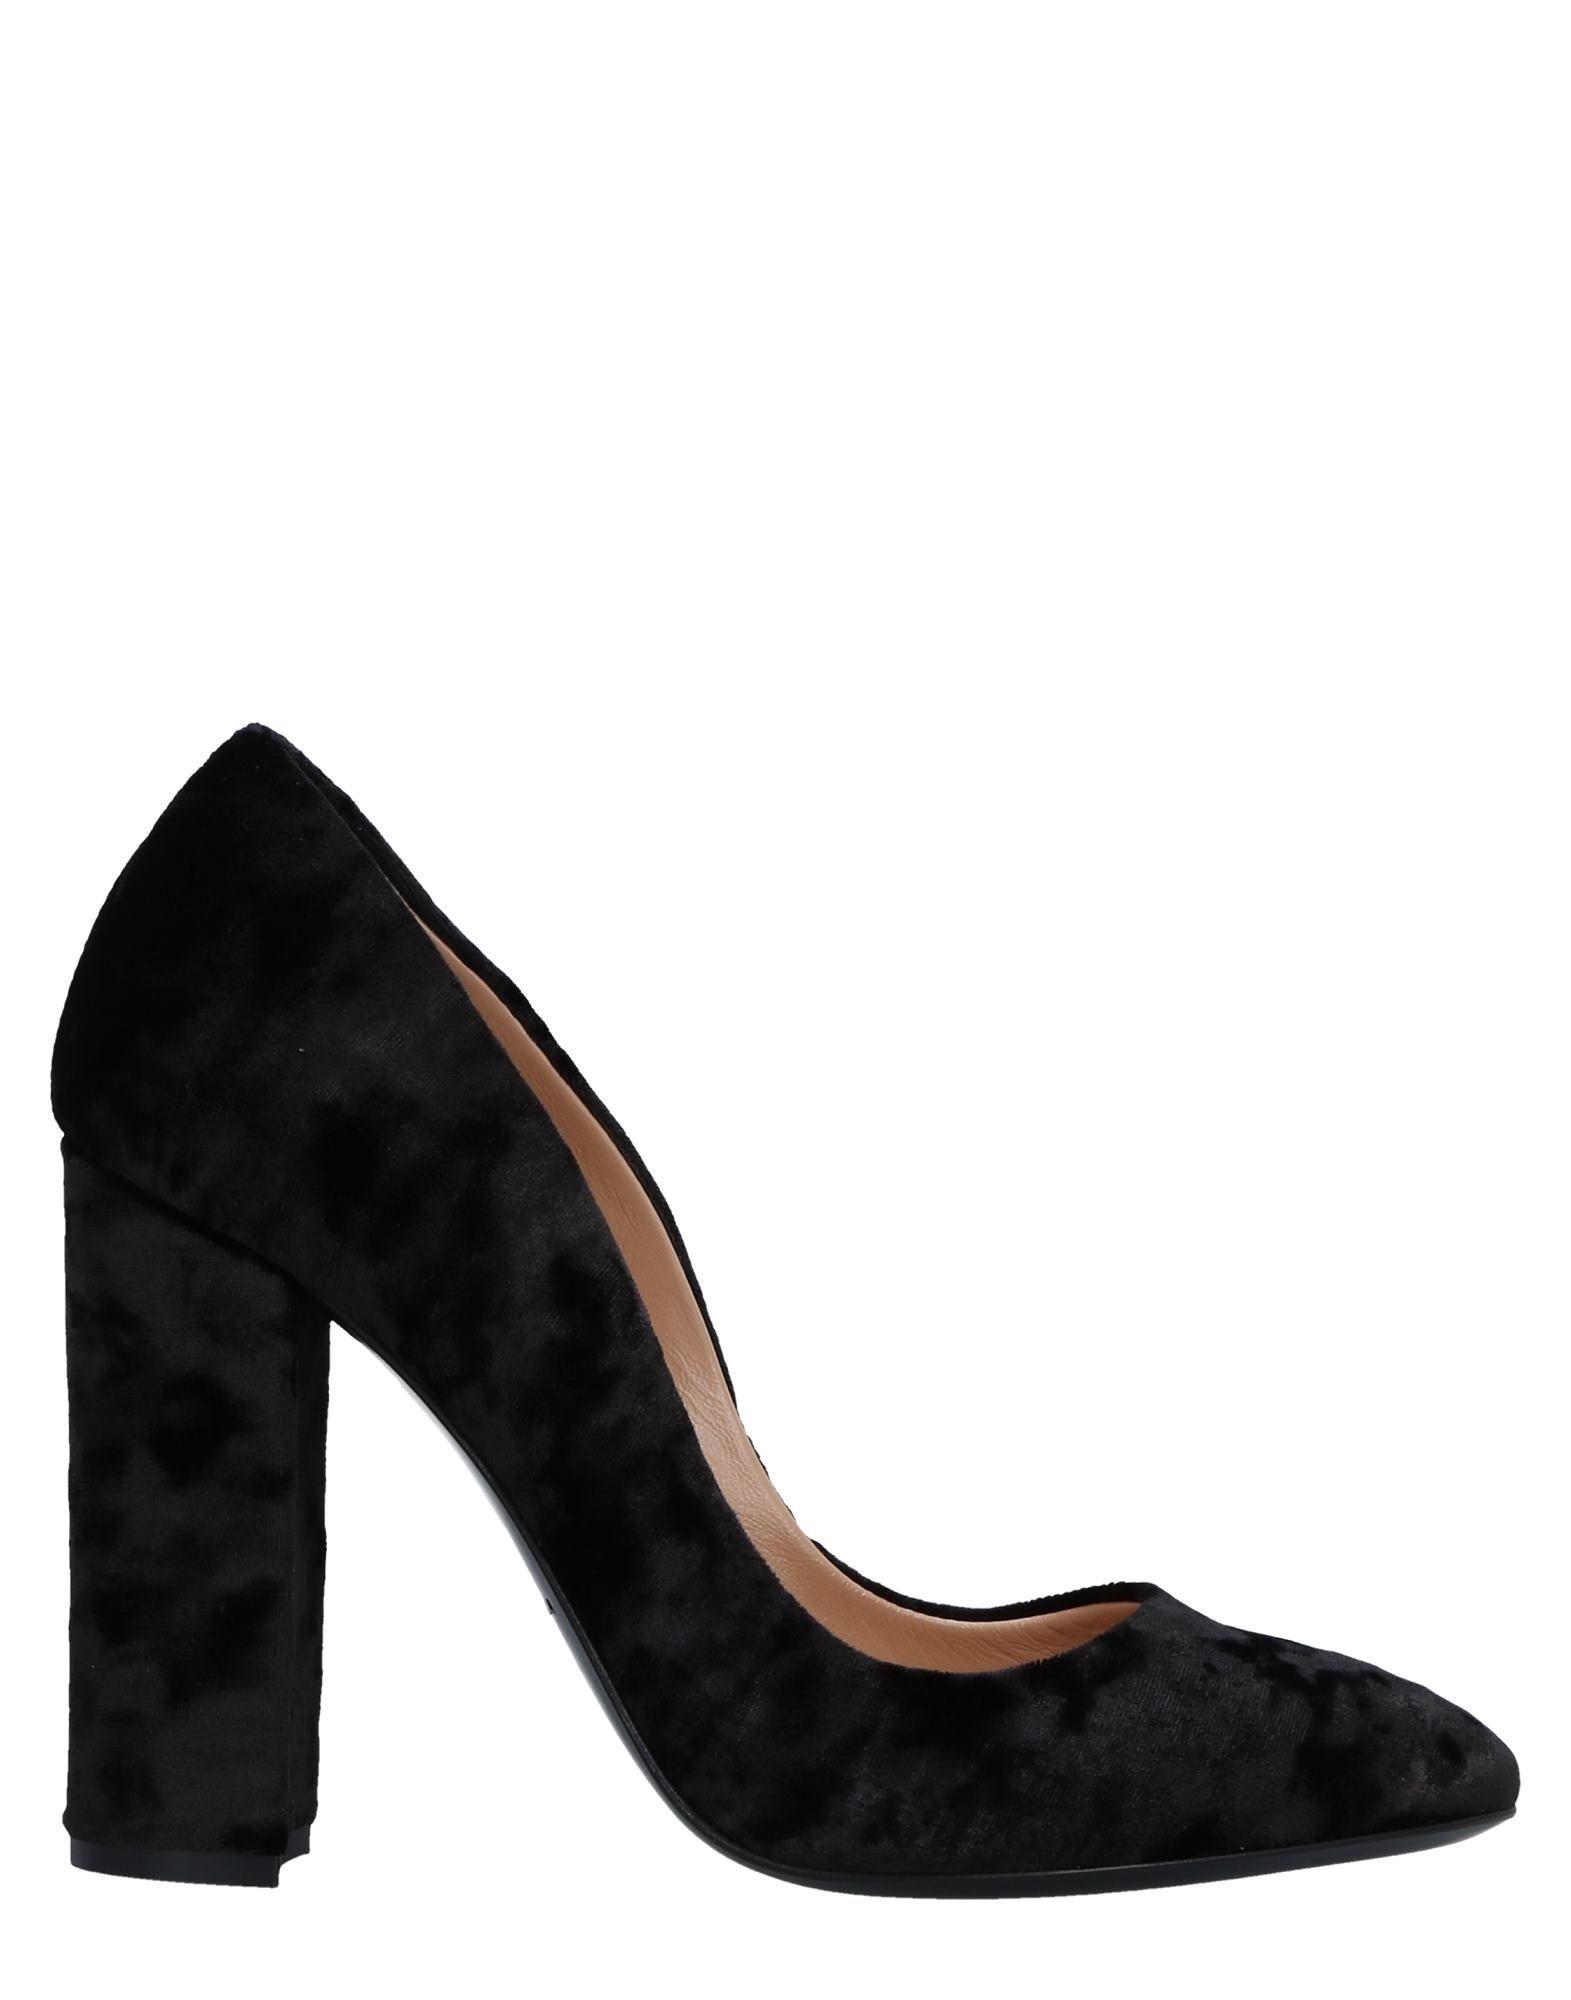 Stilvolle Pumps billige Schuhe Marco Barbabella Pumps Stilvolle Damen  11515954KV 41396c